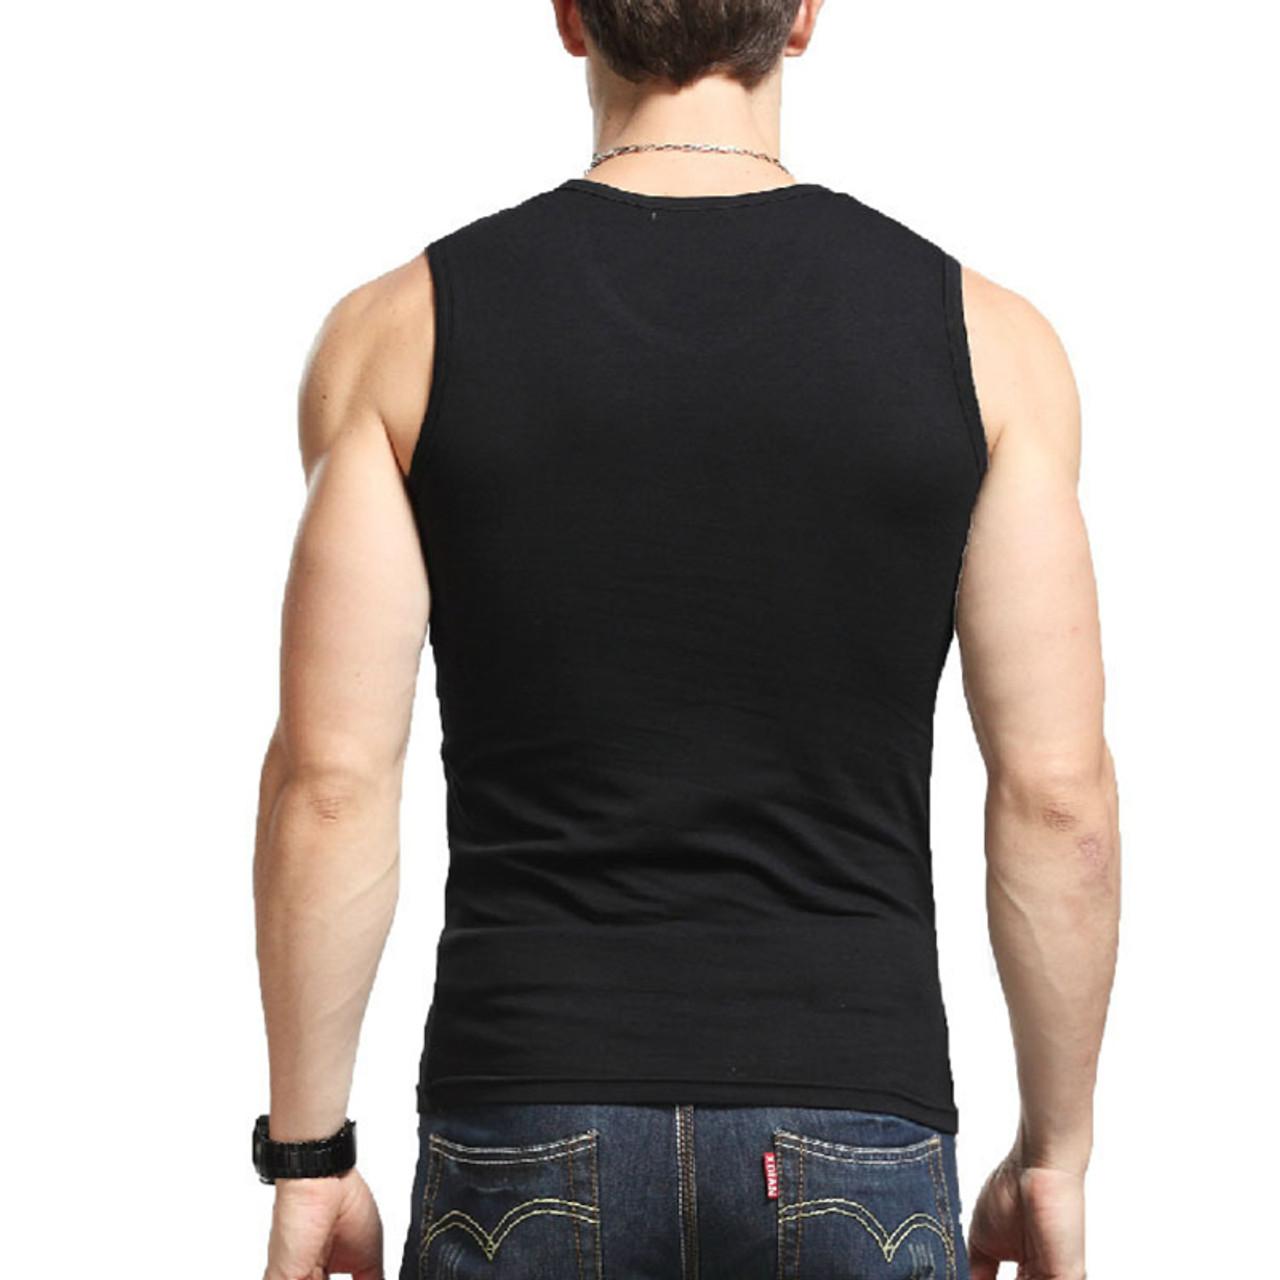 97b525f2062b0 ... 2018 Cotton Big Size Summer men clothing Tank Tops Black White Gray  Singlets Sleeveless fitness men ...